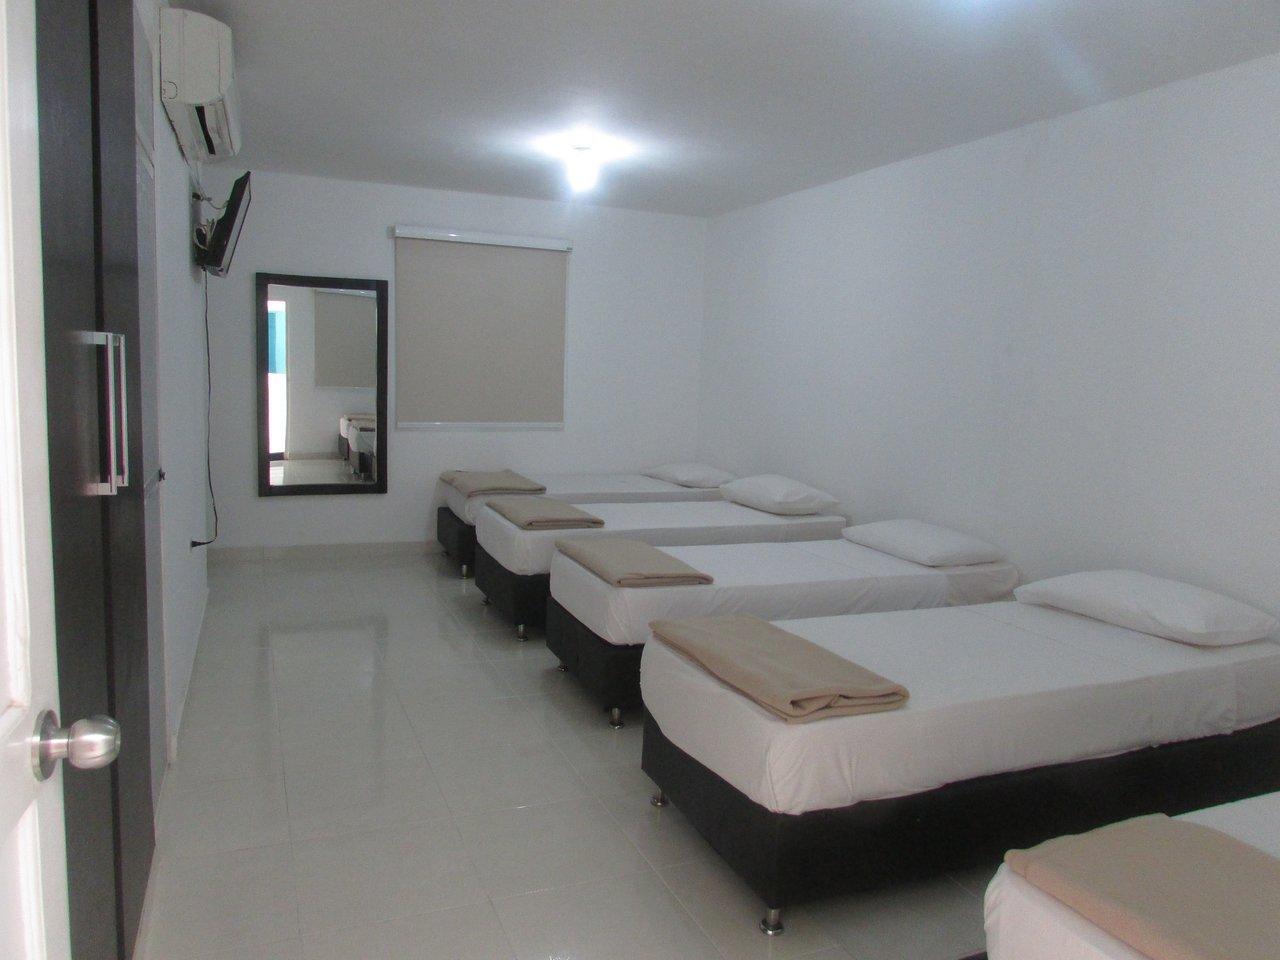 Hotel Casa Grande Riohacha Prices